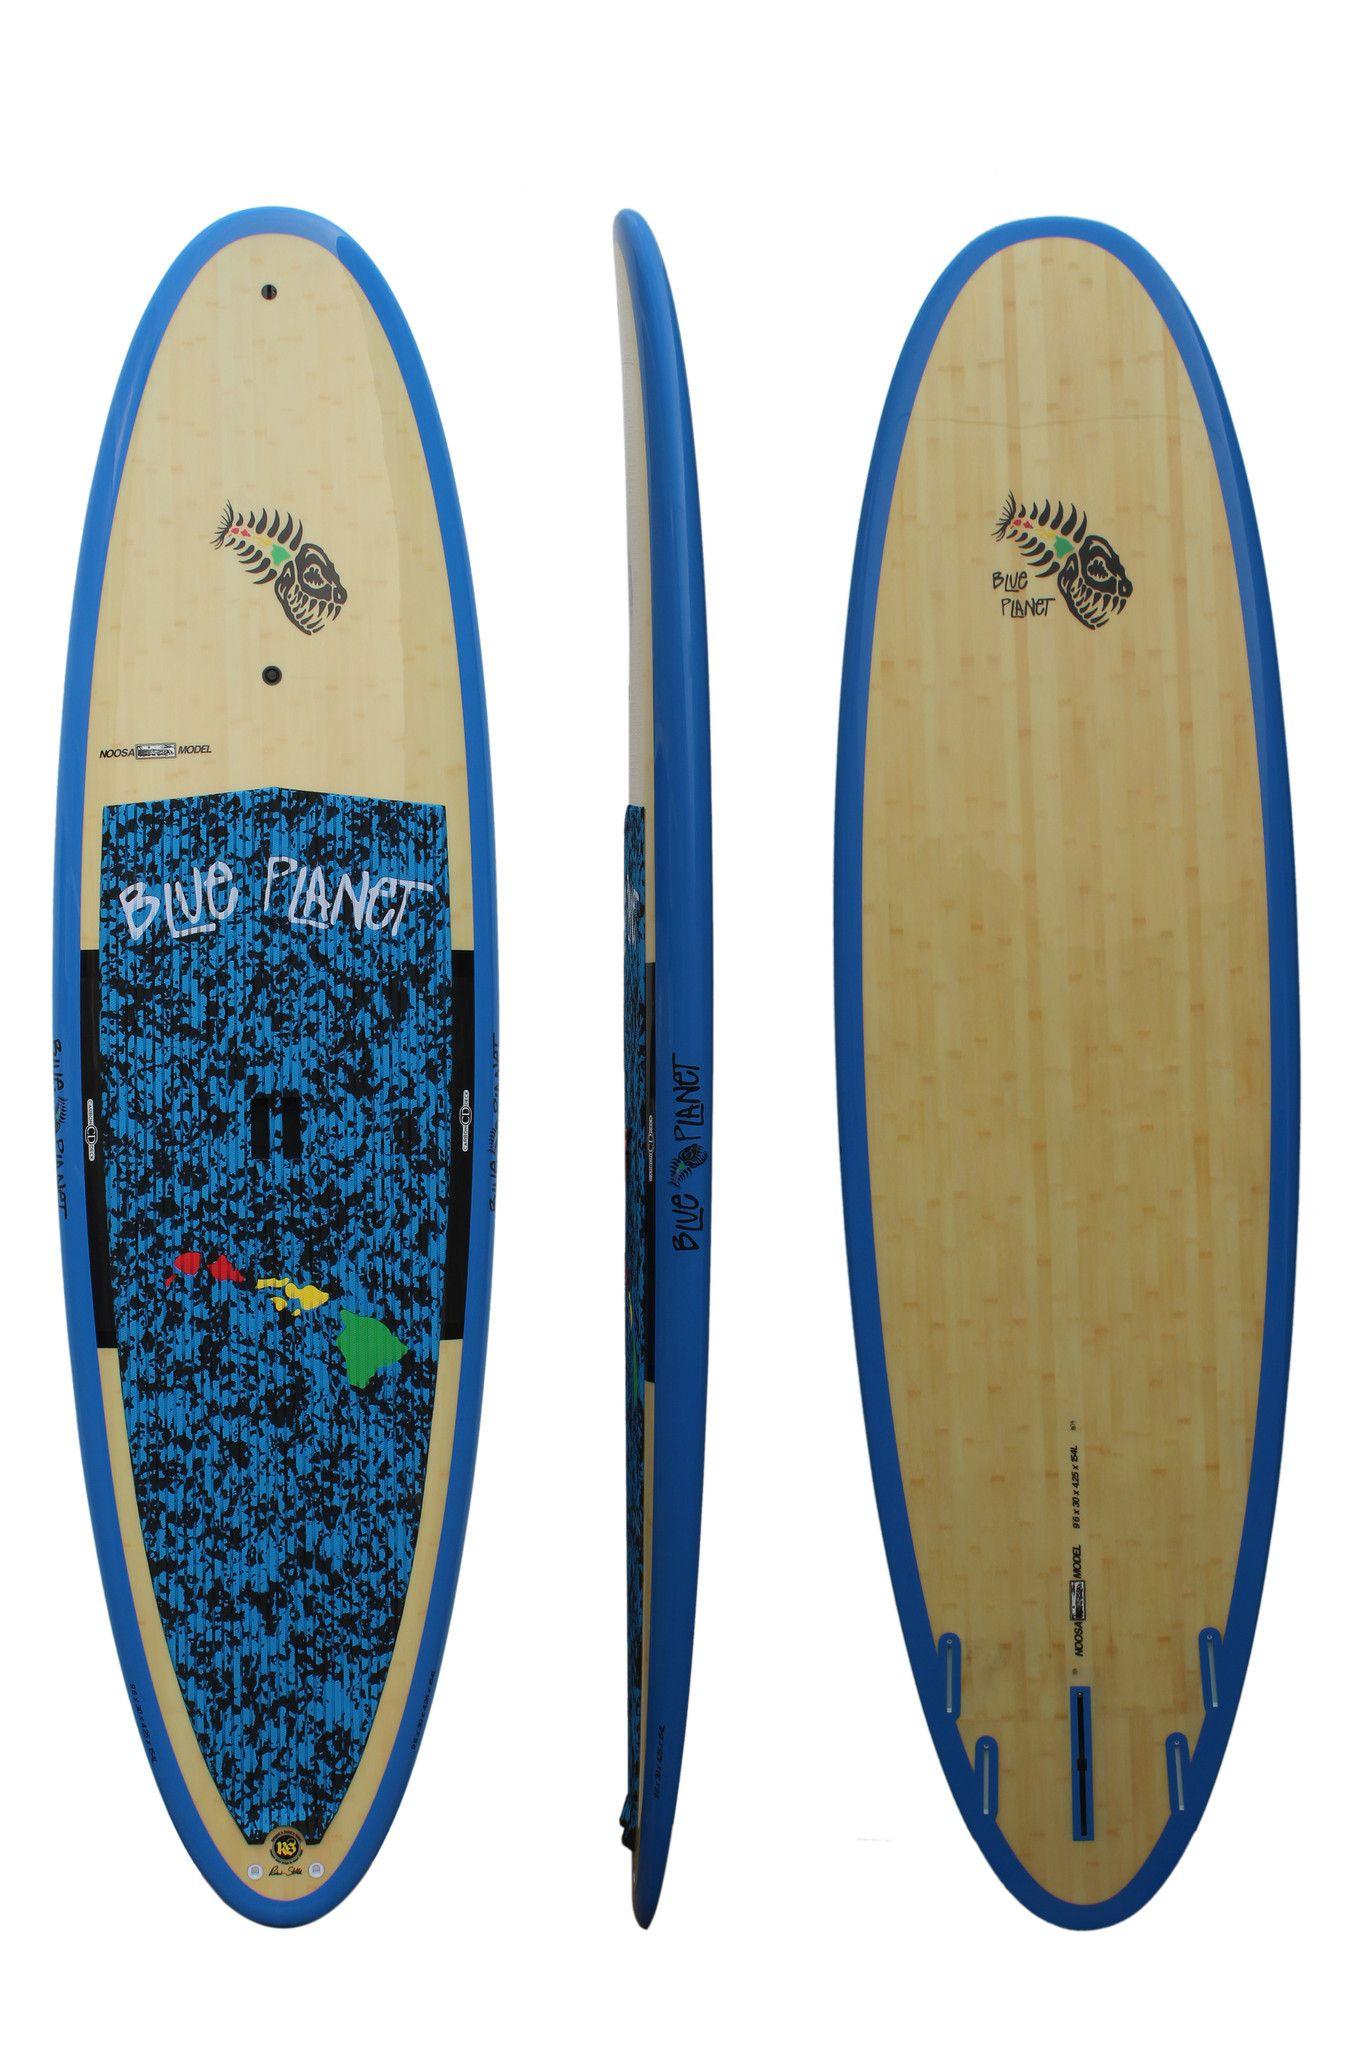 9'6 x 30 Noosa (2016) Standup Paddleboard | Blue Planet Surf Hawaii